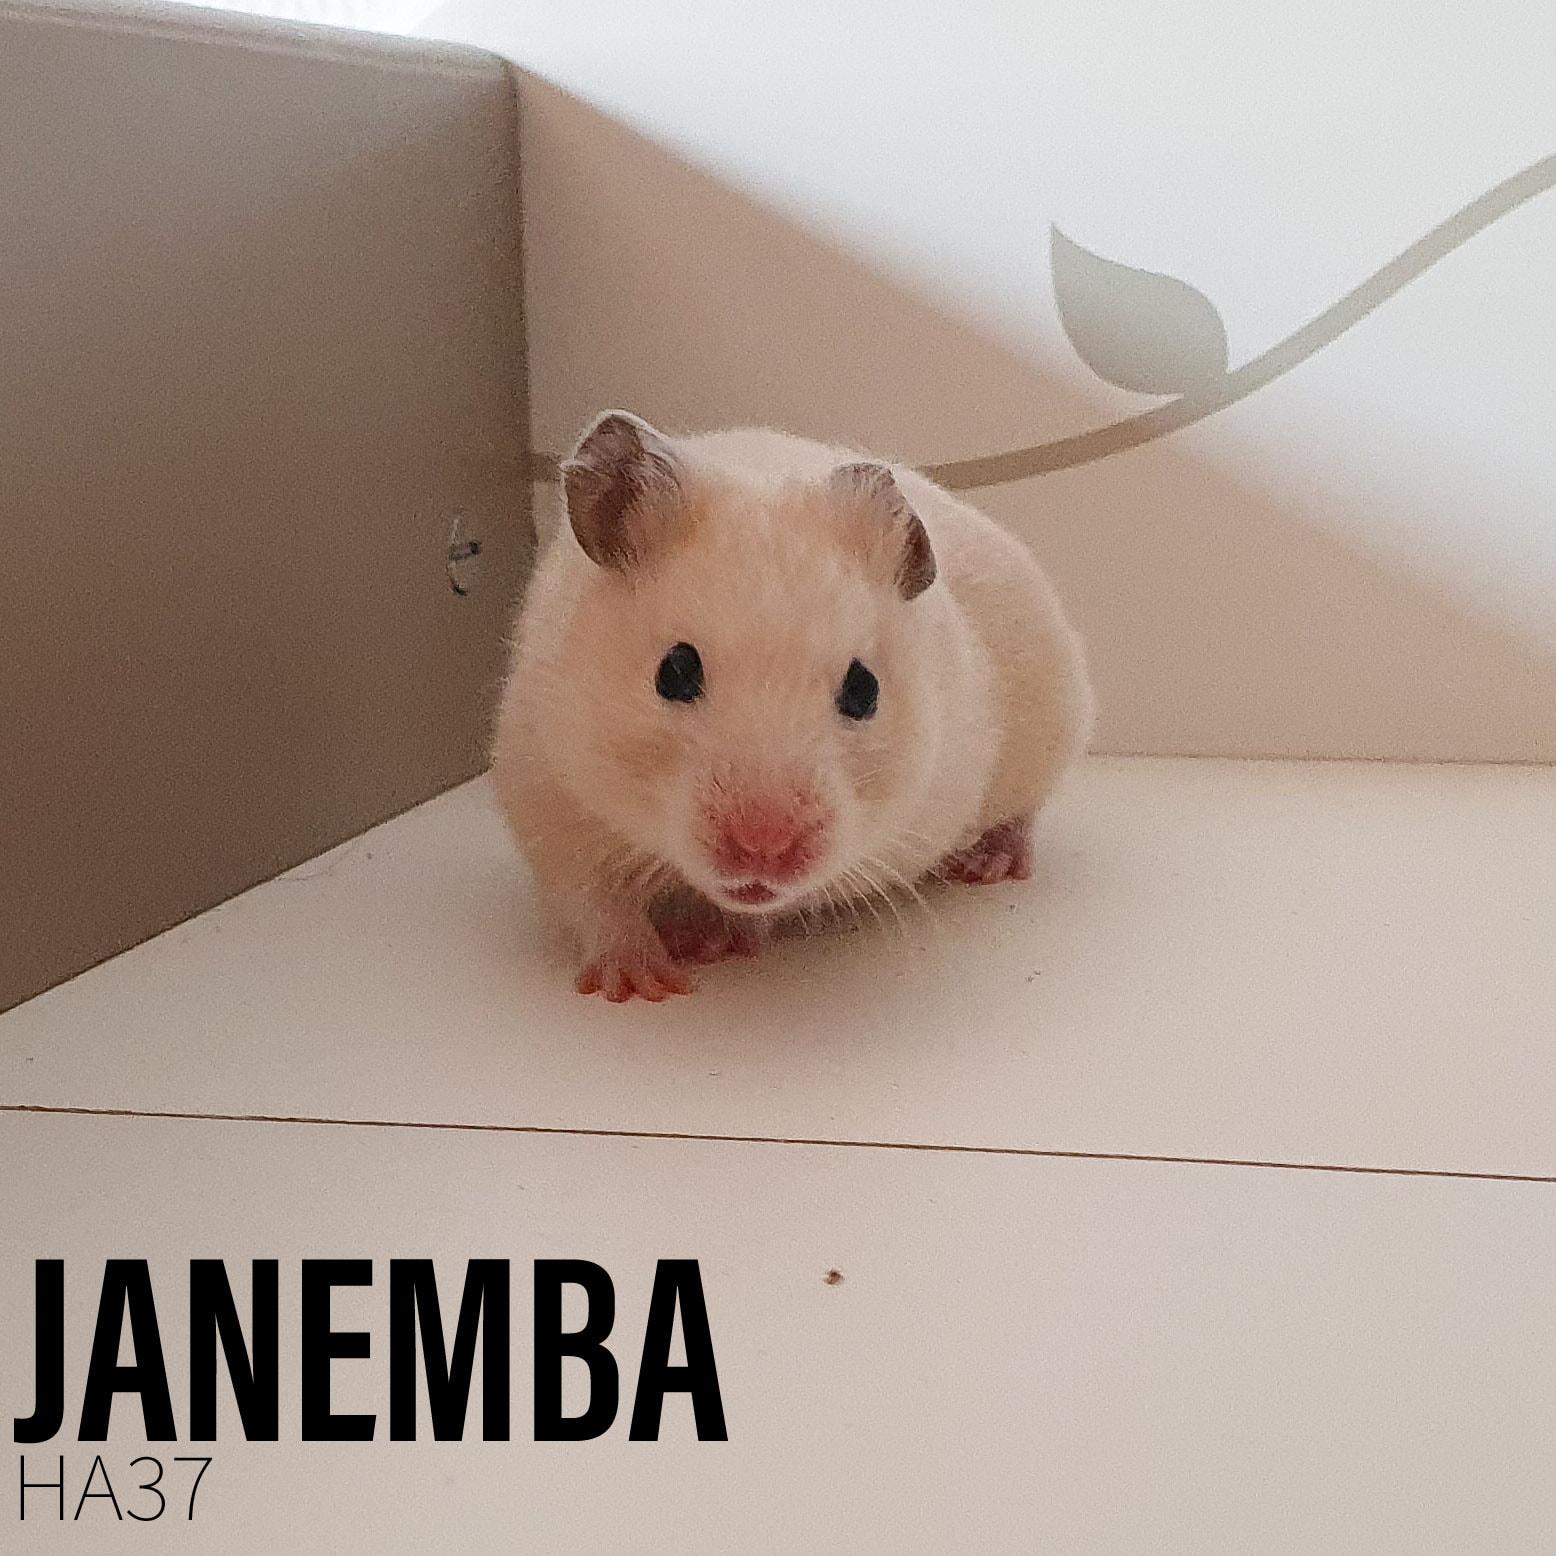 Janemba